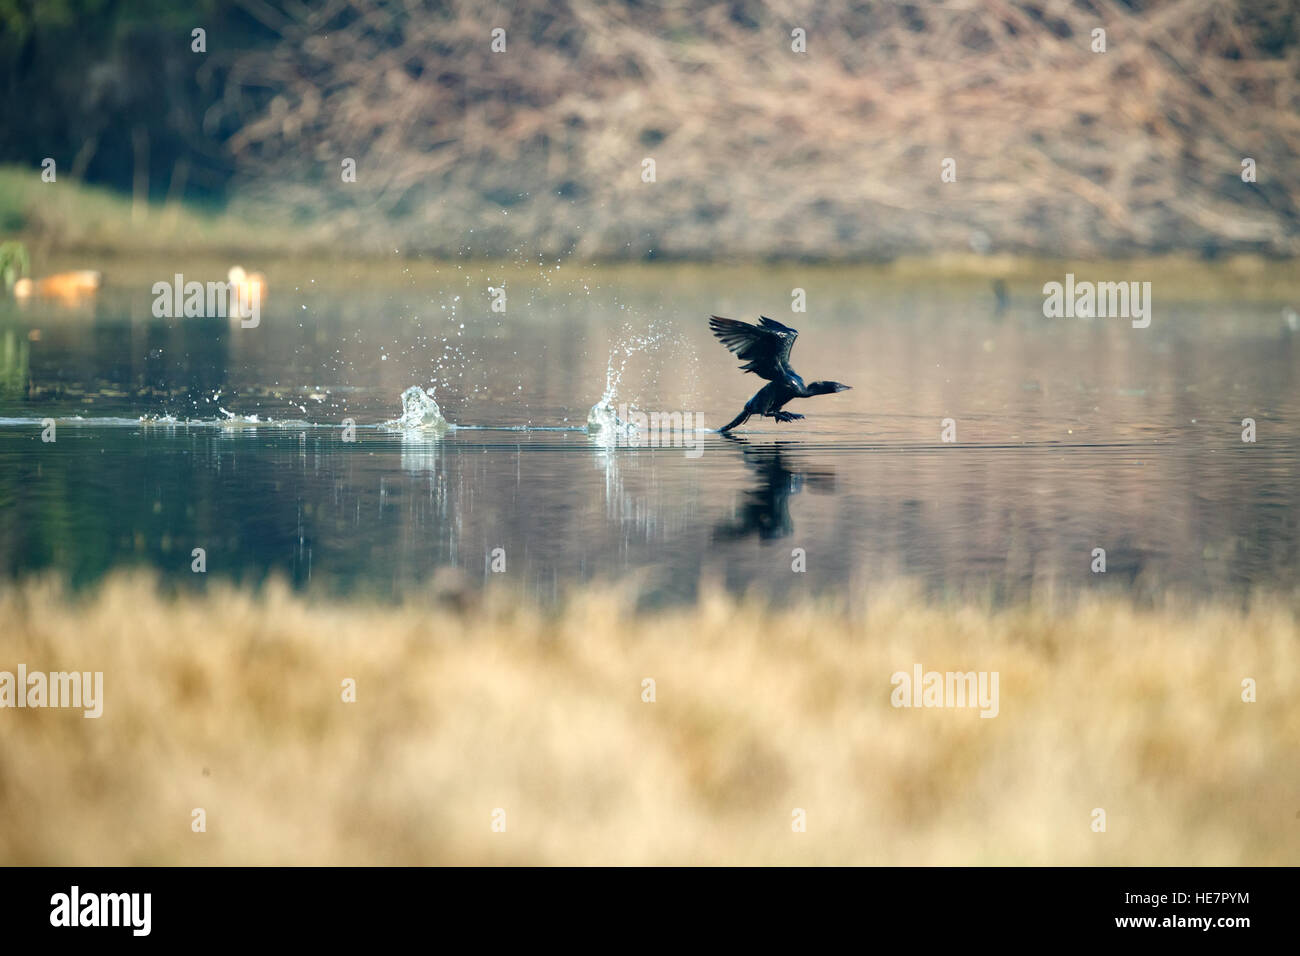 Cormorant, Phalacrocorax carbo, Black cormorant , flying above the  river - Stock Image